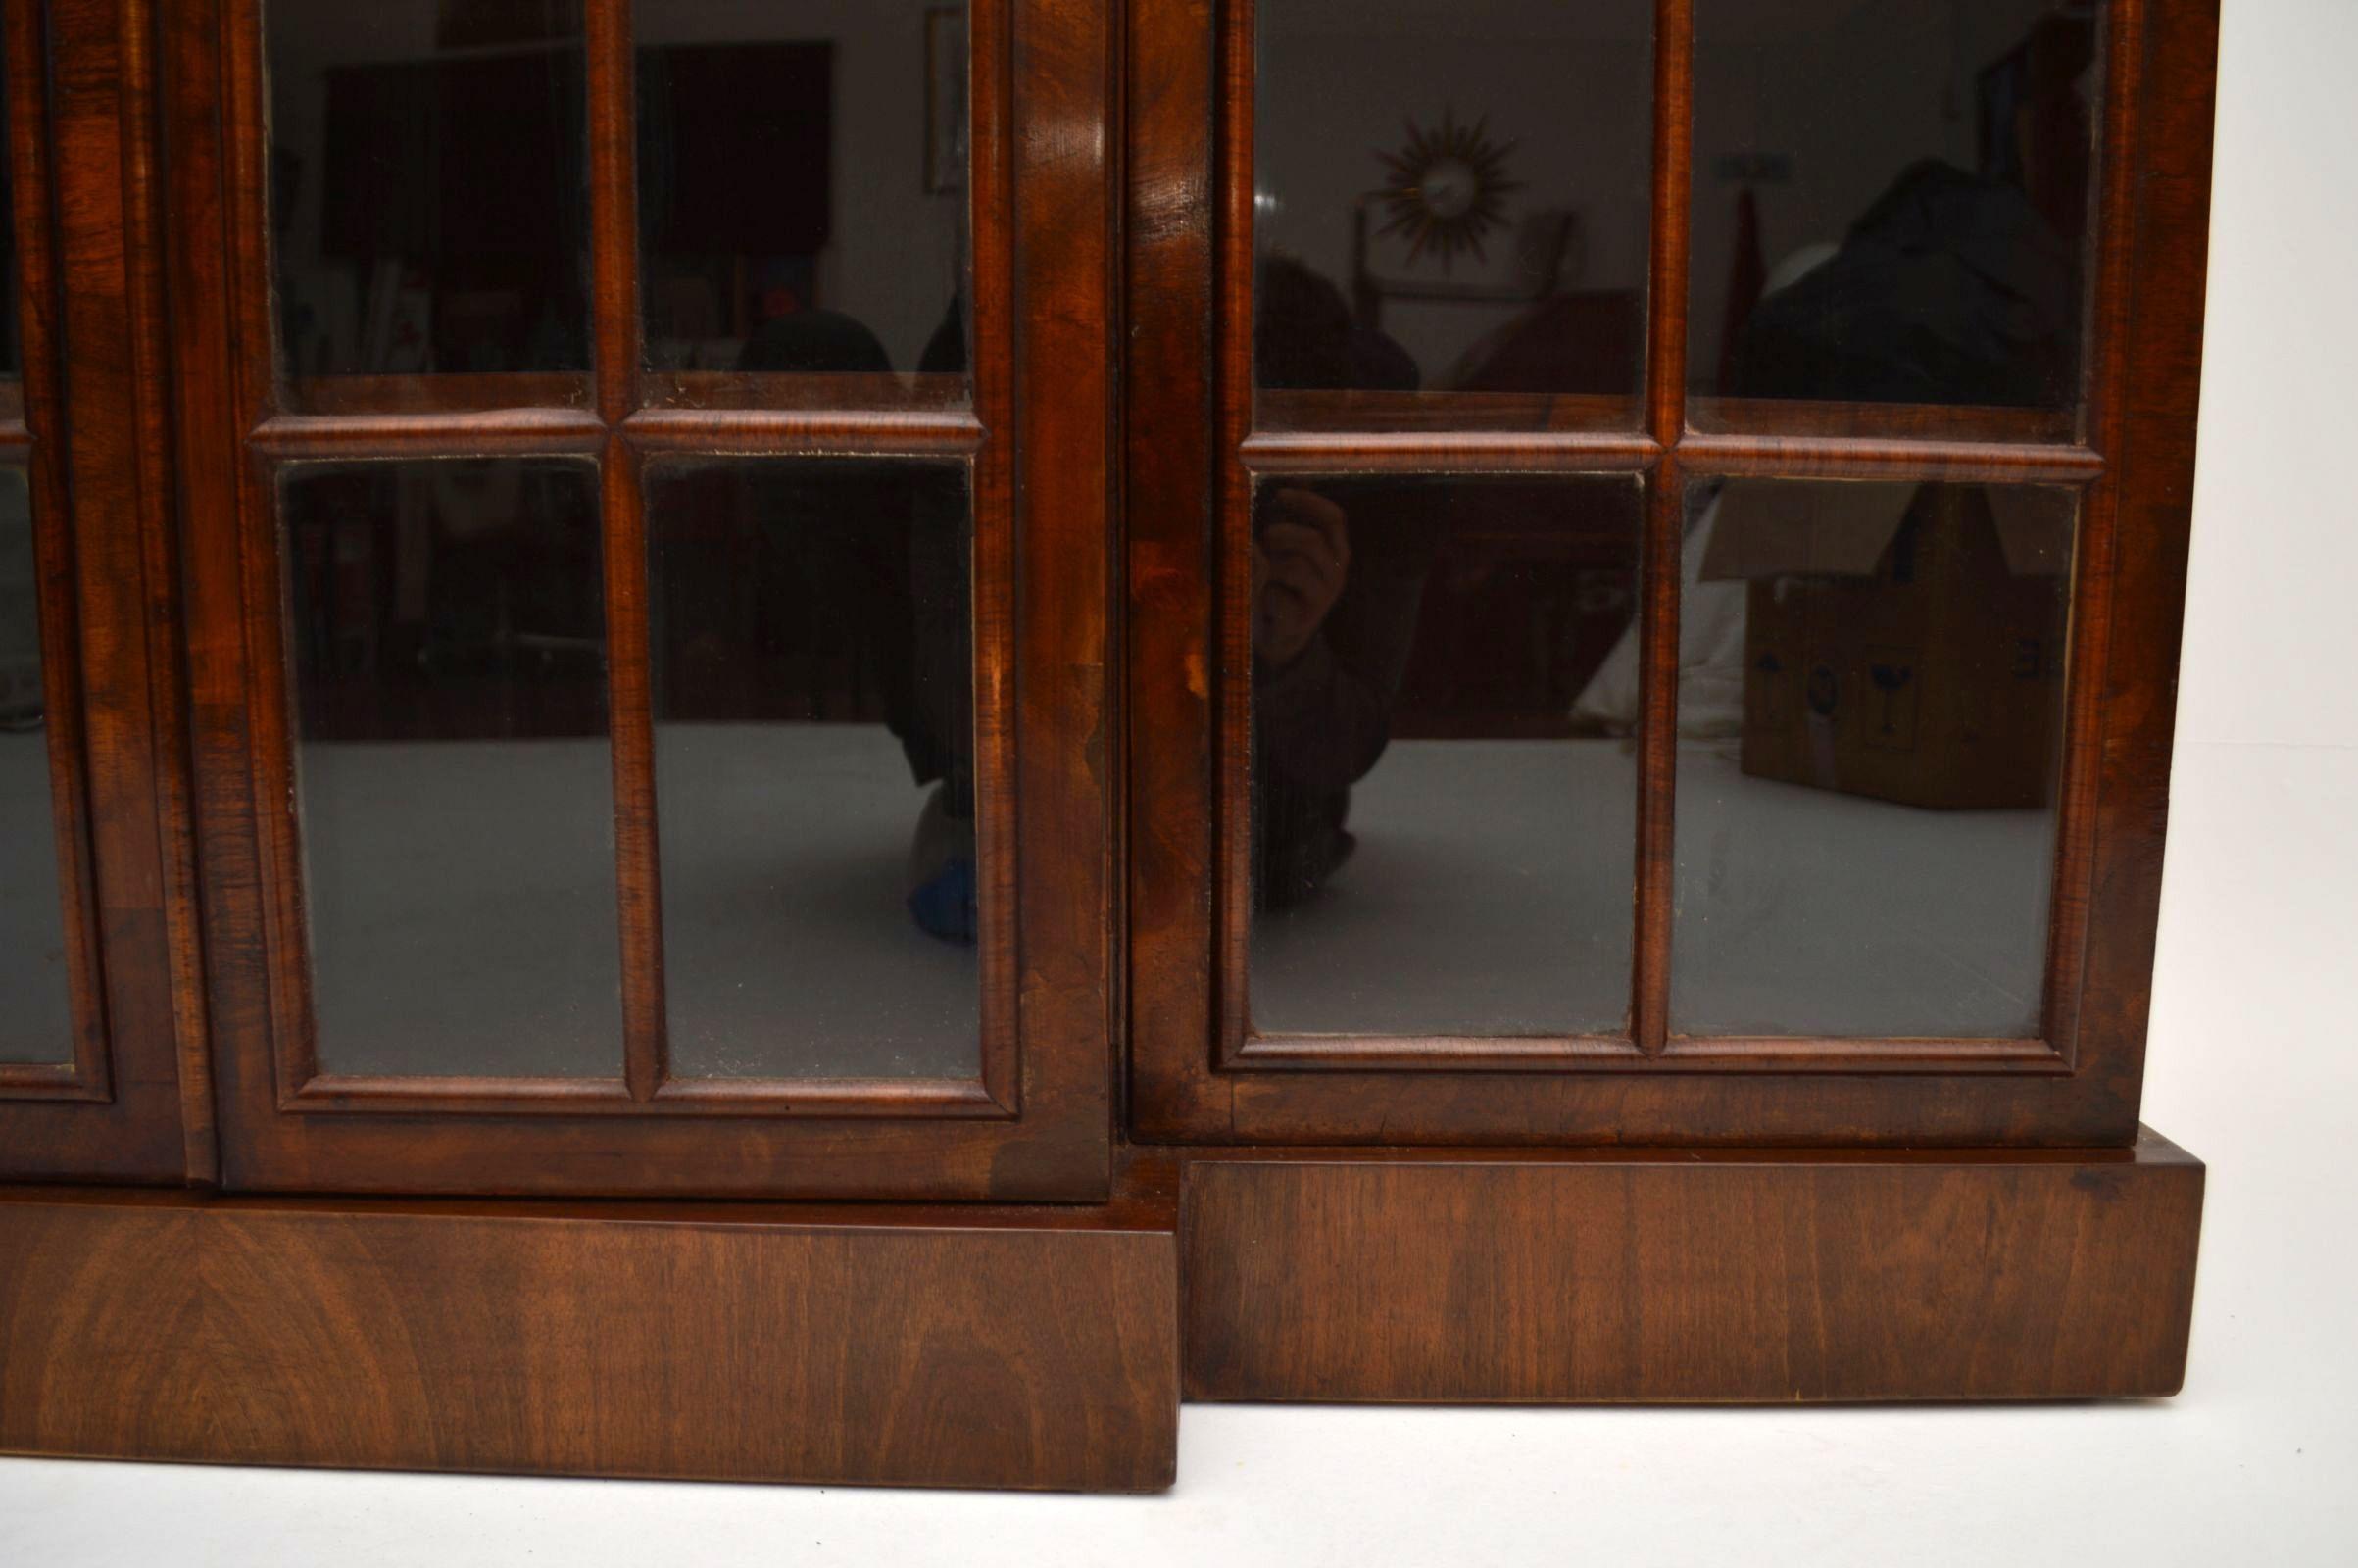 antikes walnuss b cherregal b cherschrank aus holz. Black Bedroom Furniture Sets. Home Design Ideas